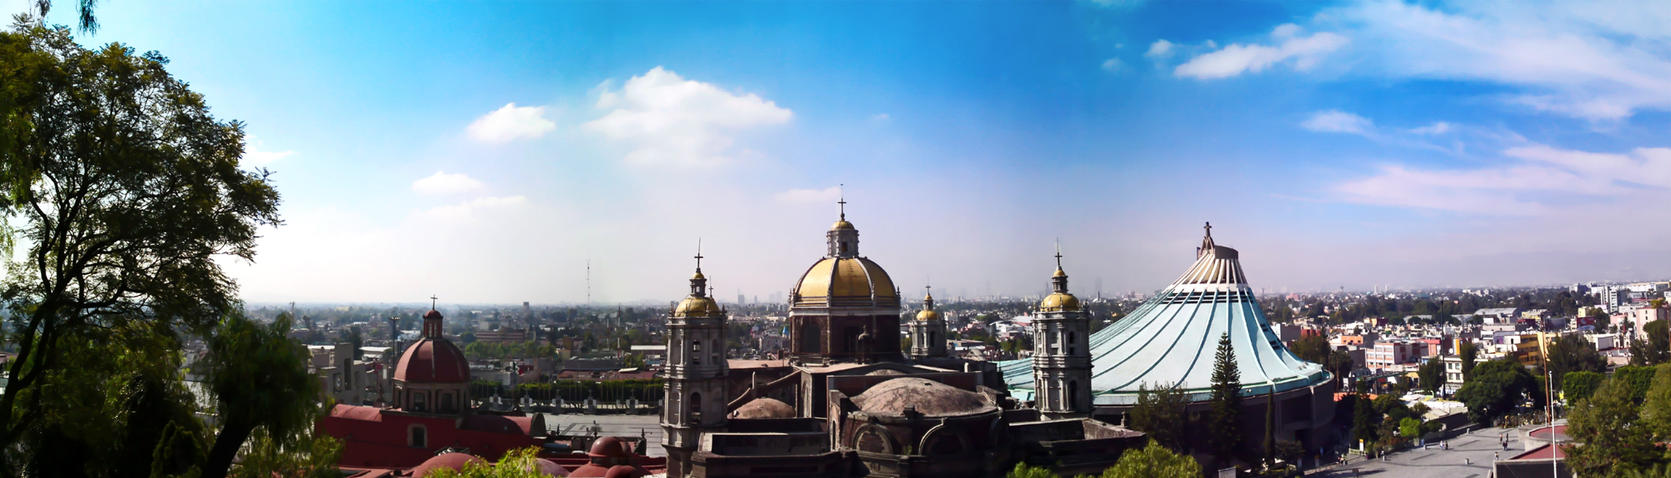 La Basilica De Guadalupe by ARLEQUINLUST